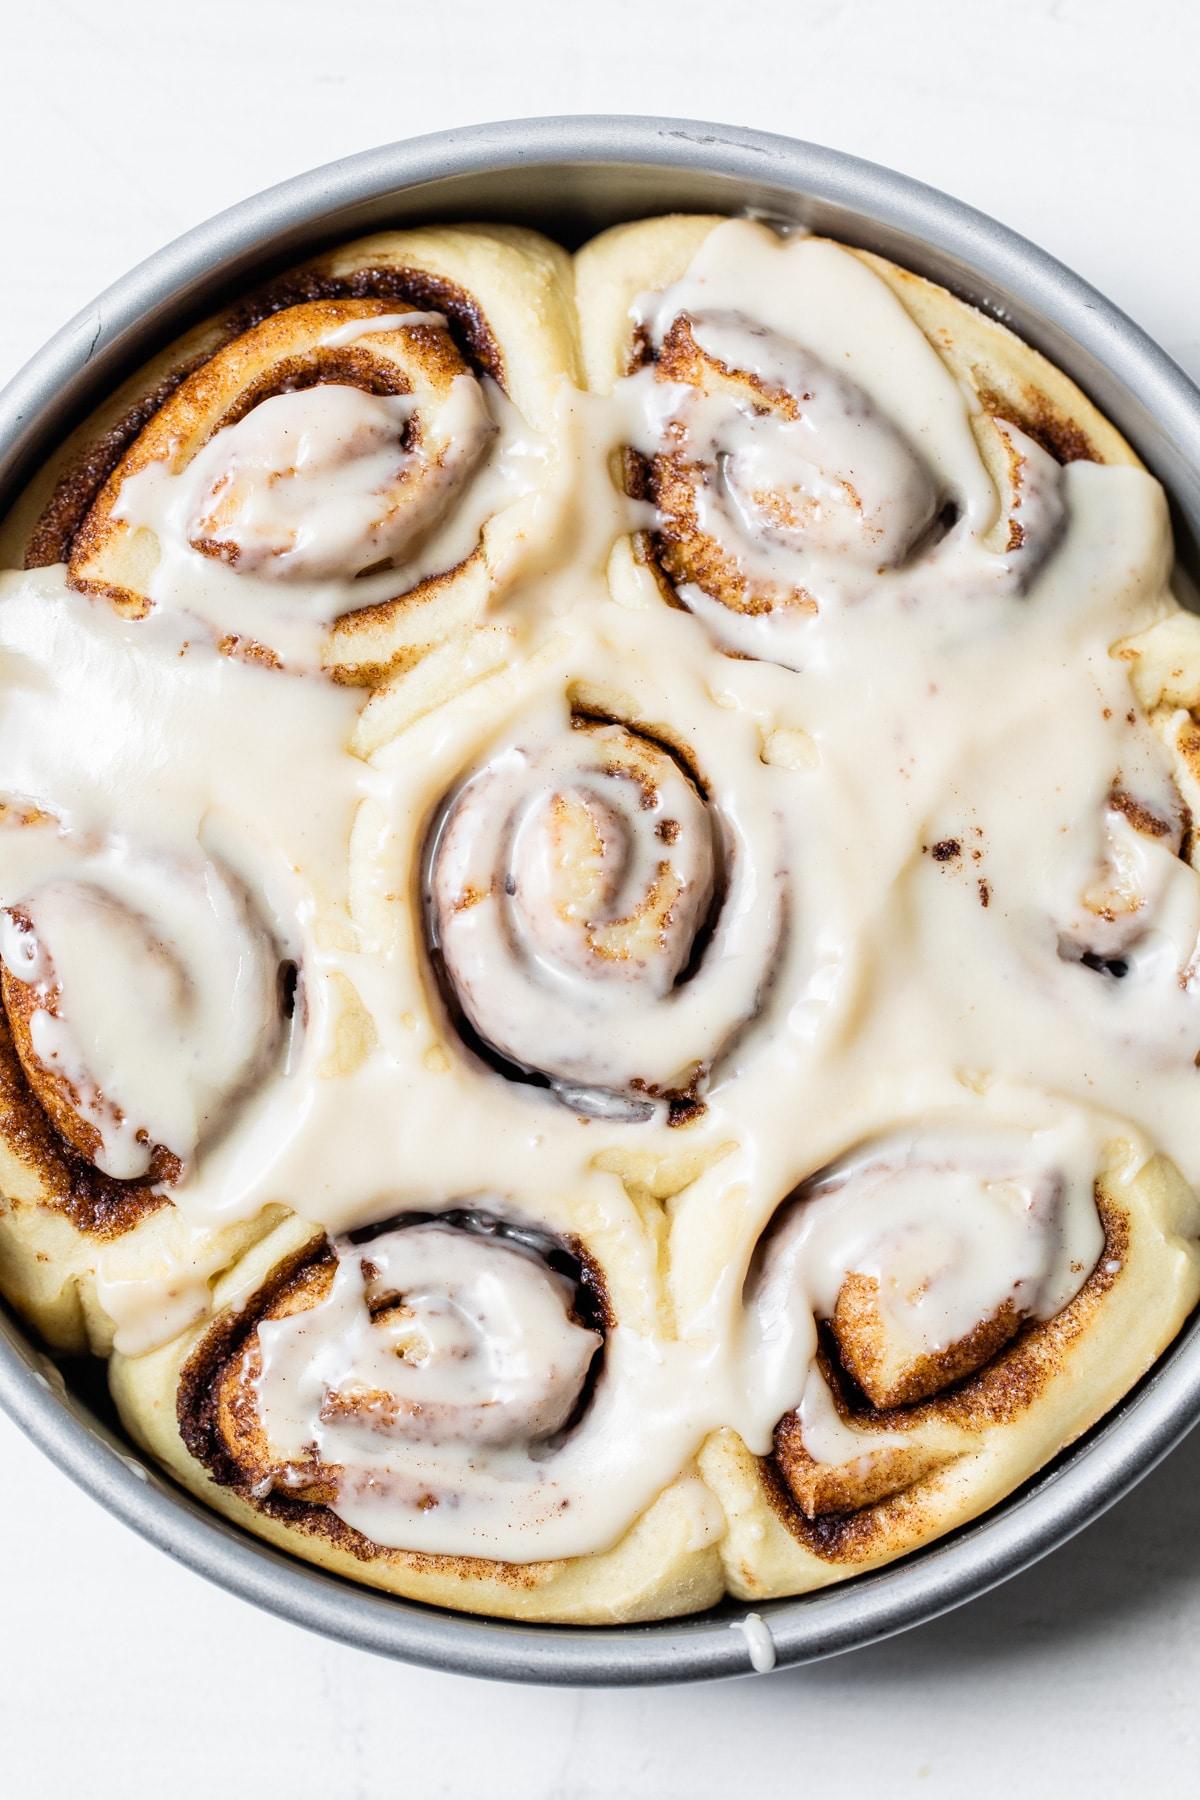 cinnamon rolls in a cake pan